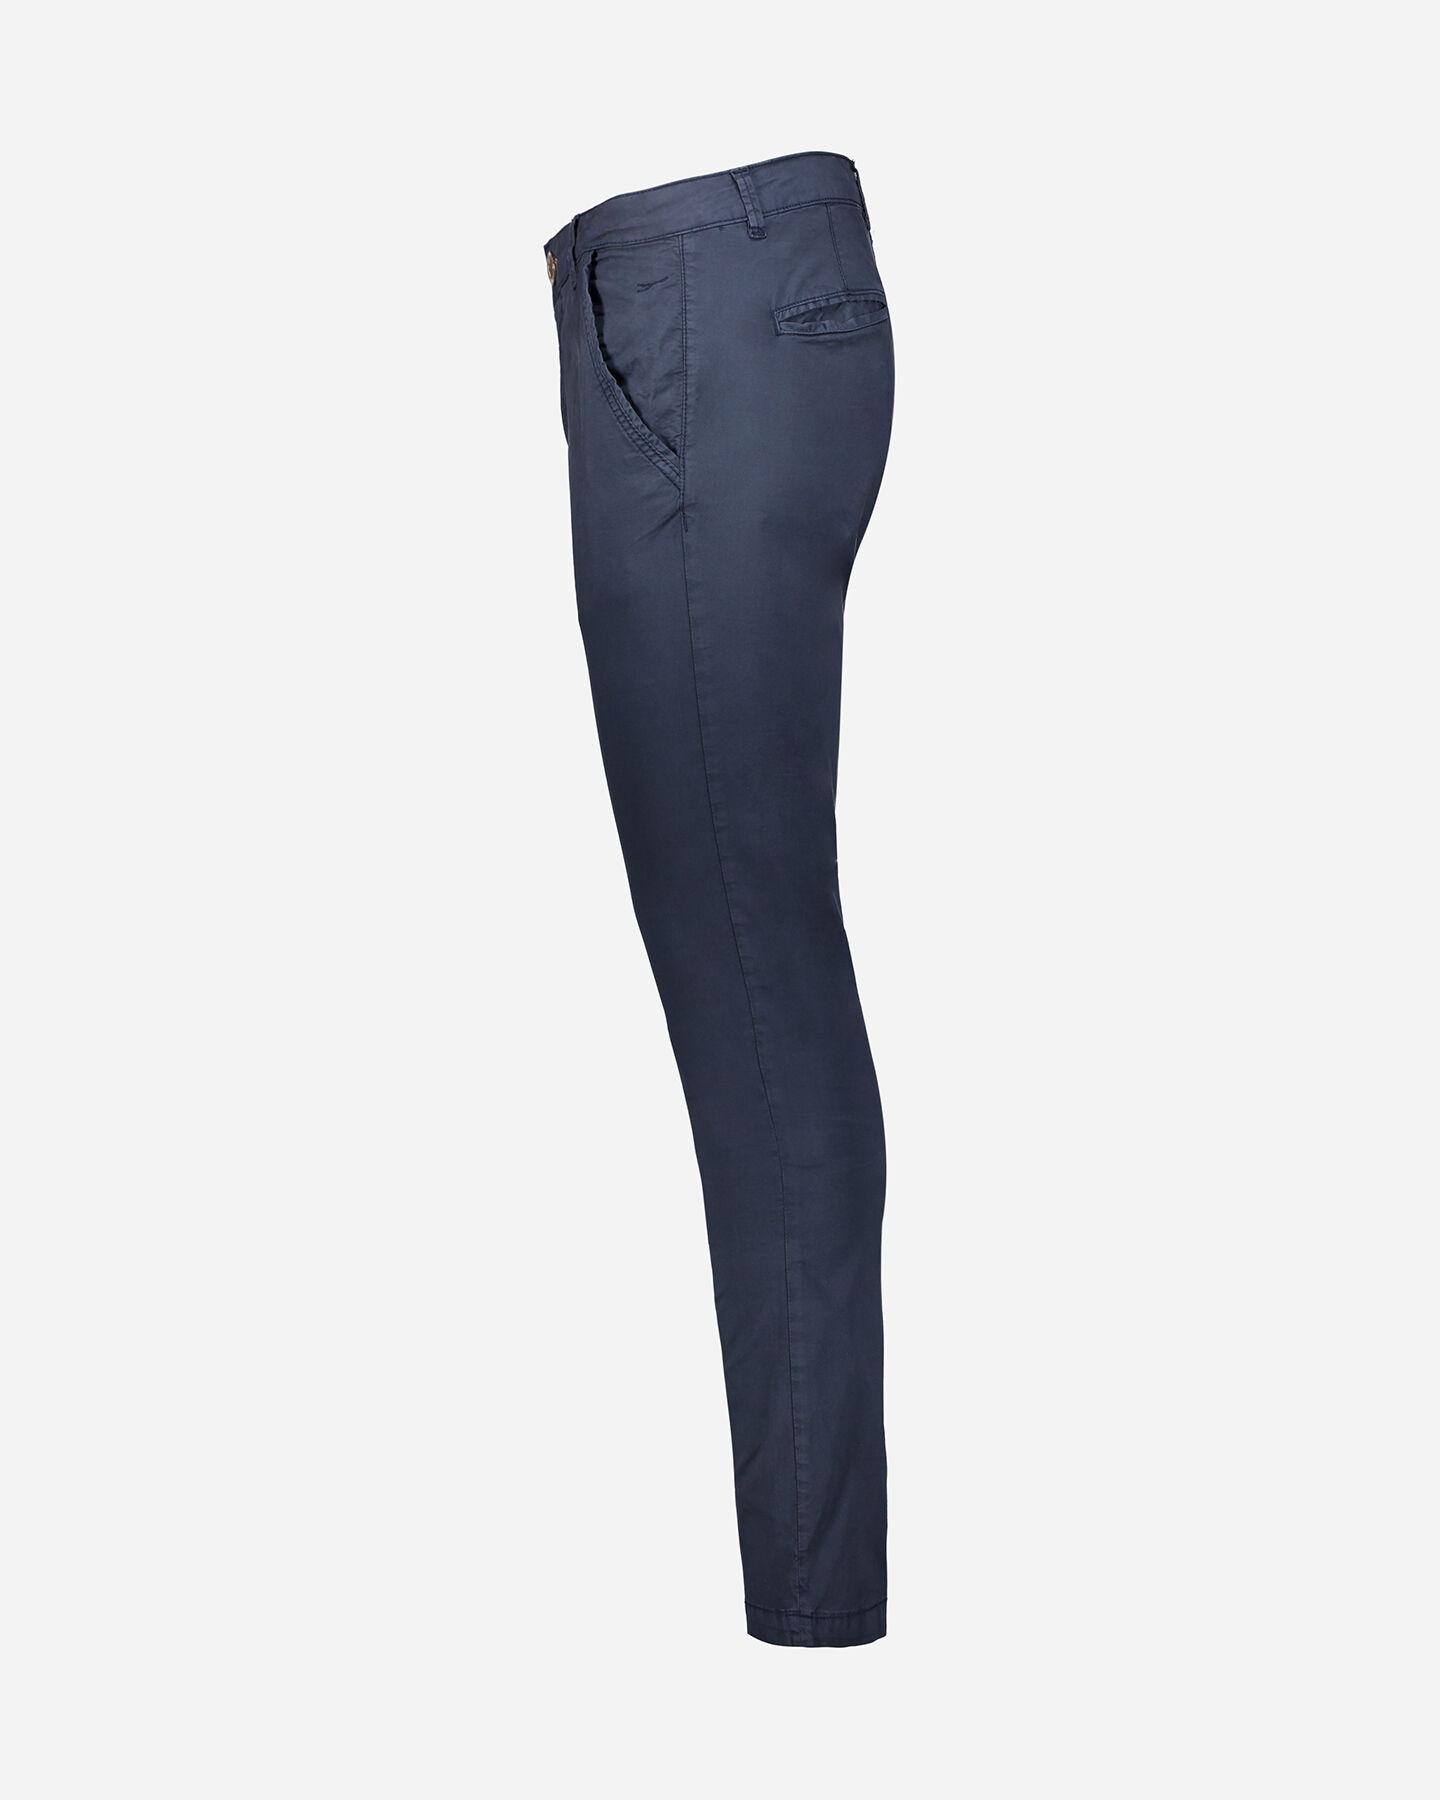 Pantalone COTTON BELT CHINO SLIM M S4065095 scatto 1